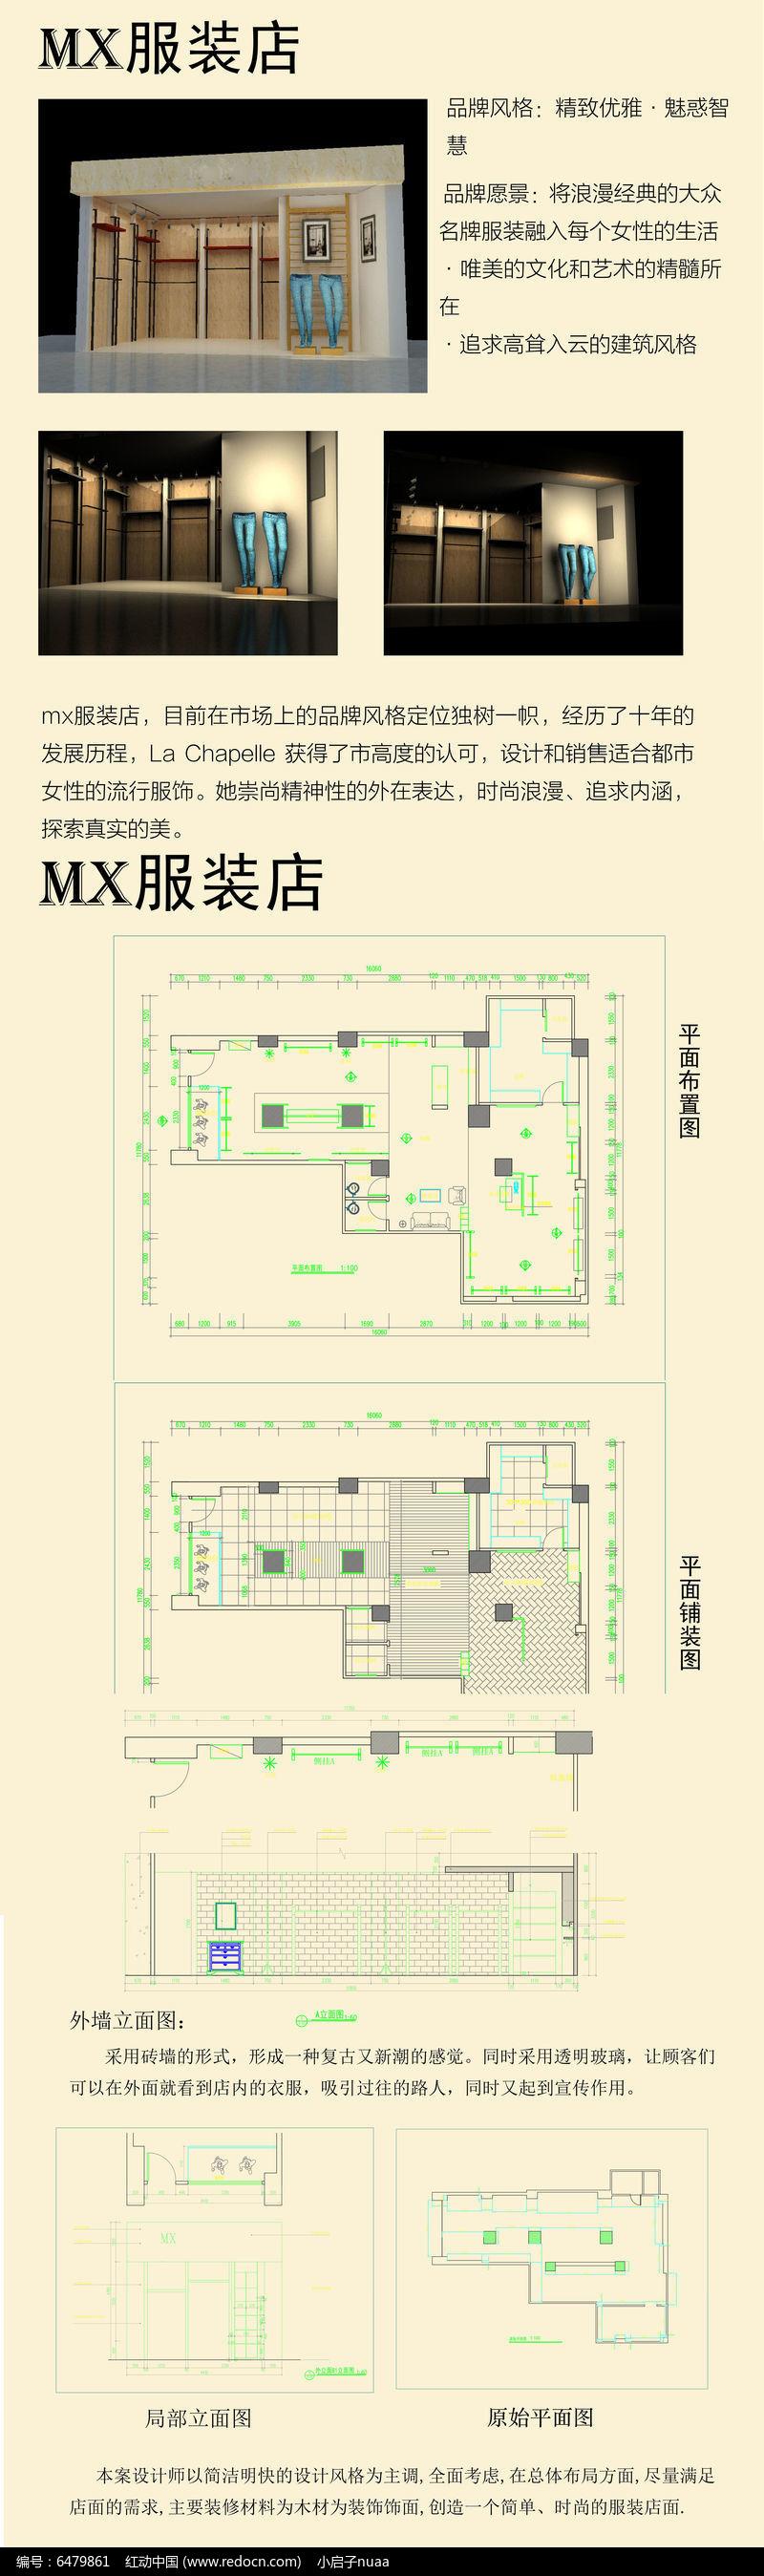 mx服装专卖店展示空间设计3d效果图源文件 cad平立面源文件